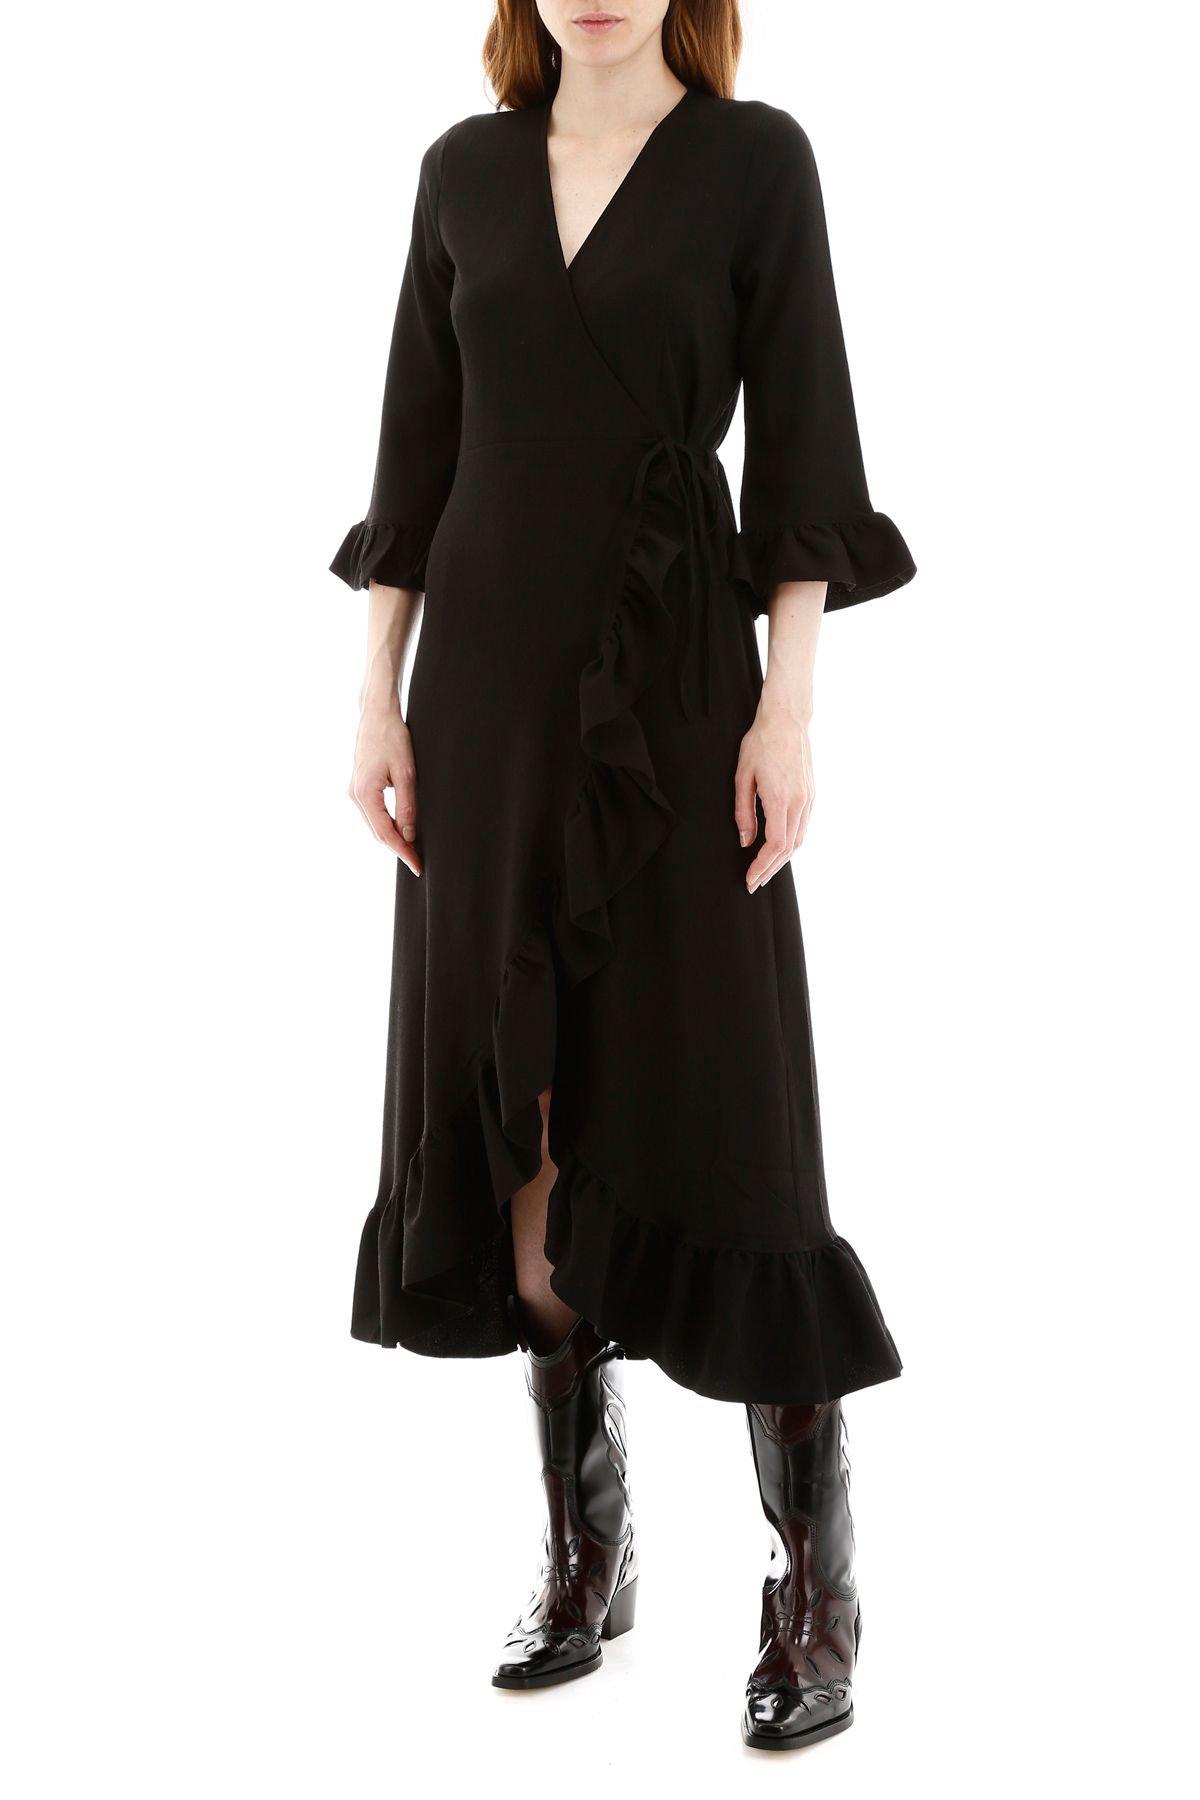 Women's Clothing Ganni for Woman Black